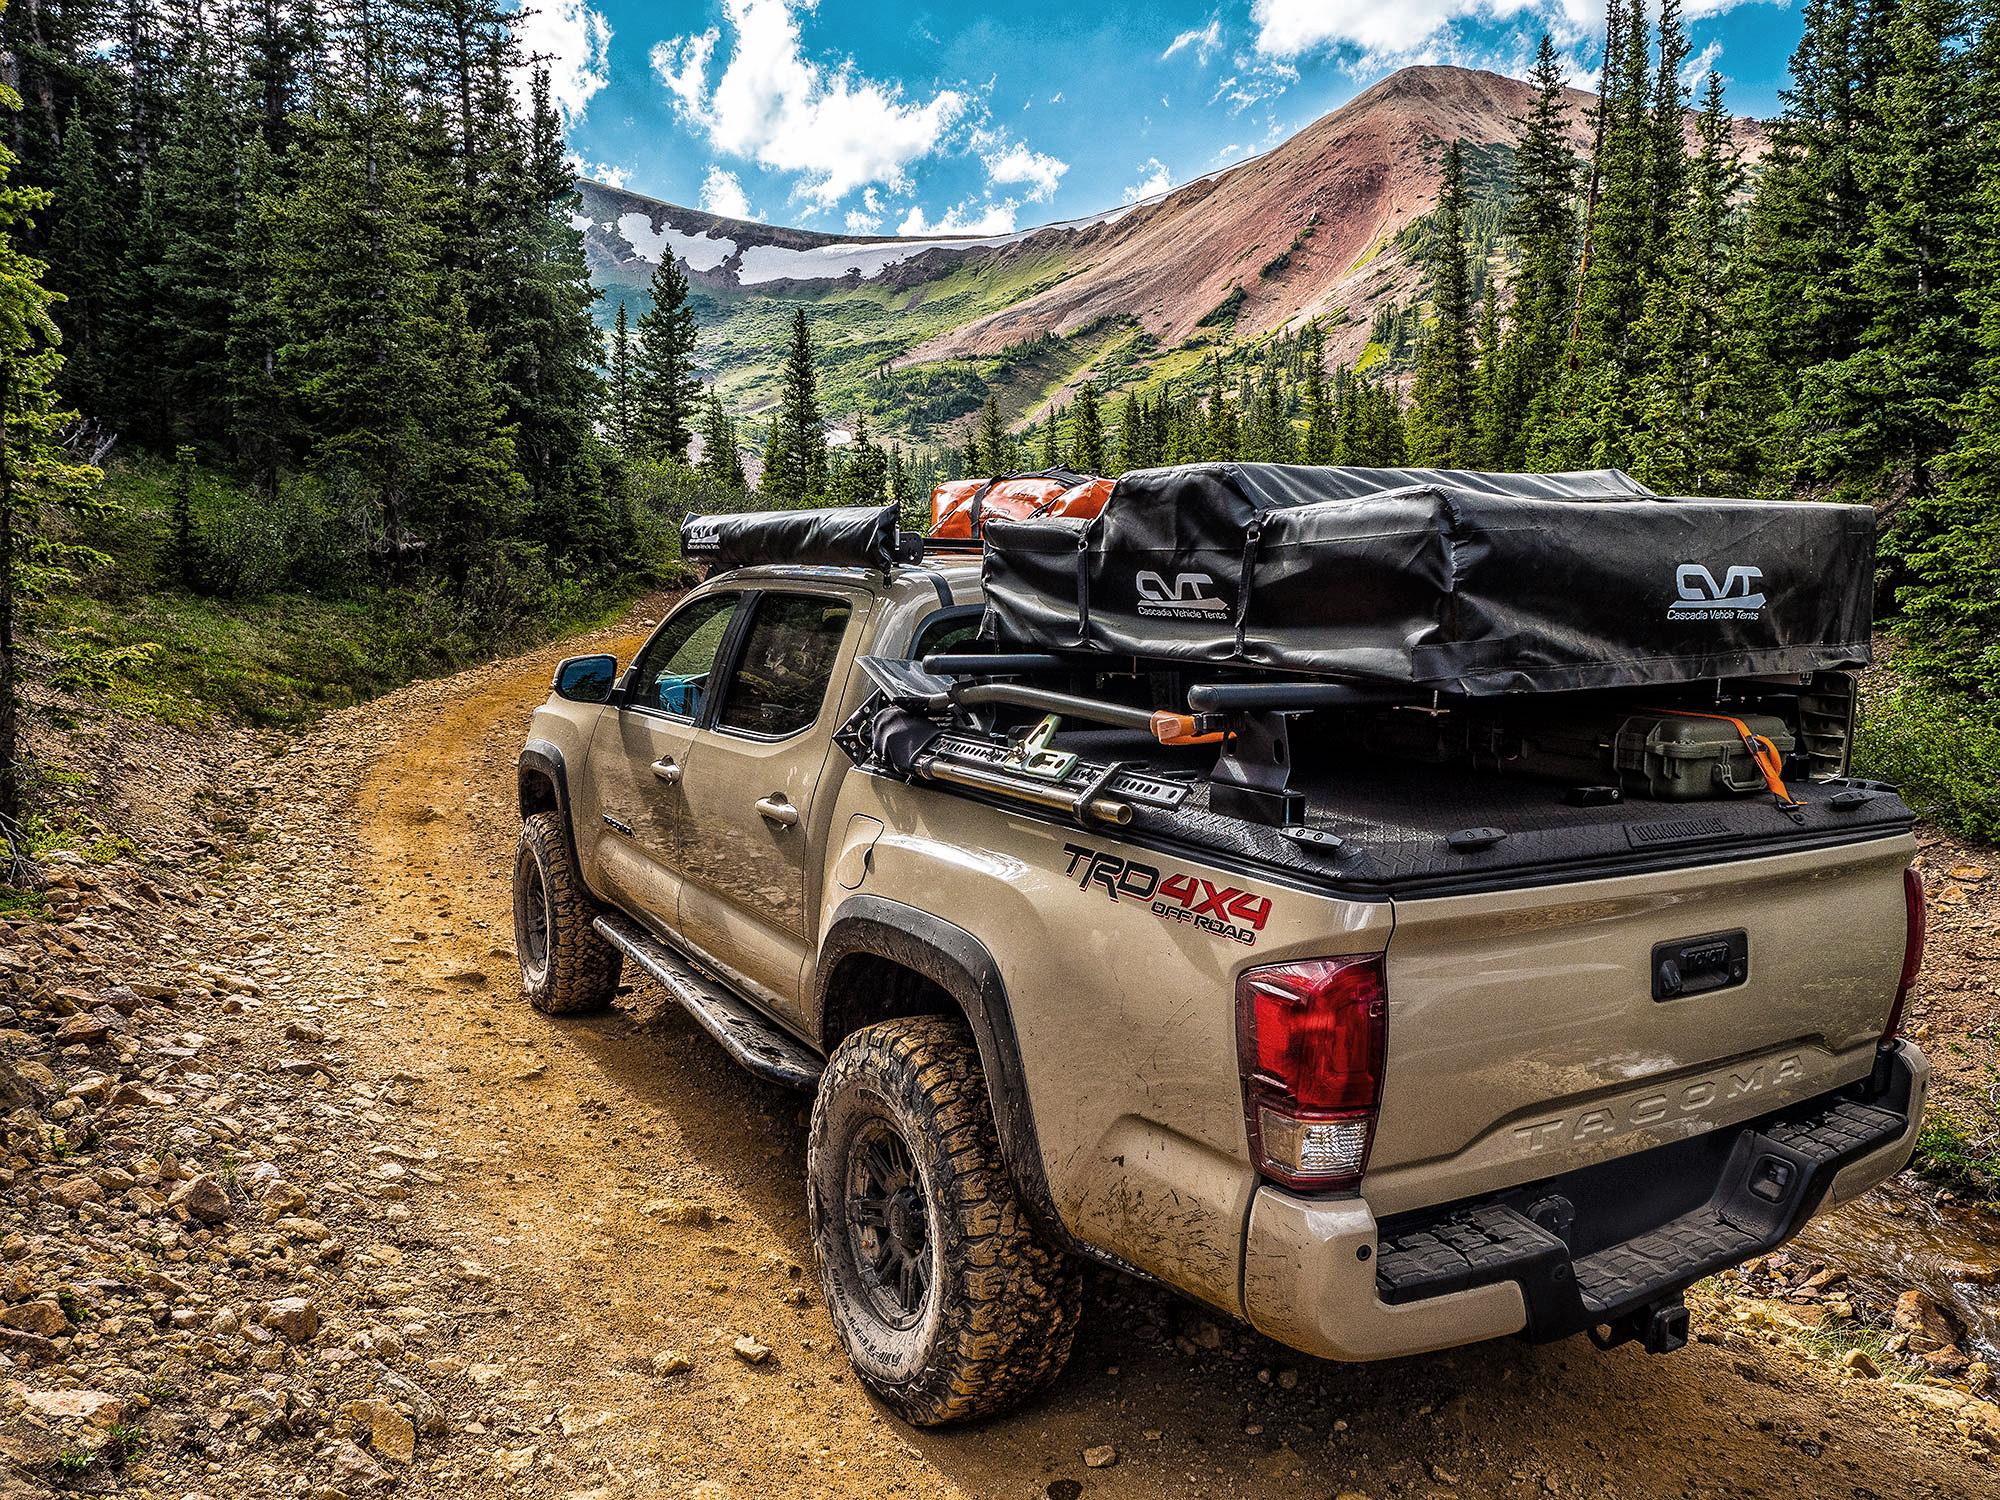 diamondback-hd-black-lifestyle-angle-driving-tent-llod.jpg